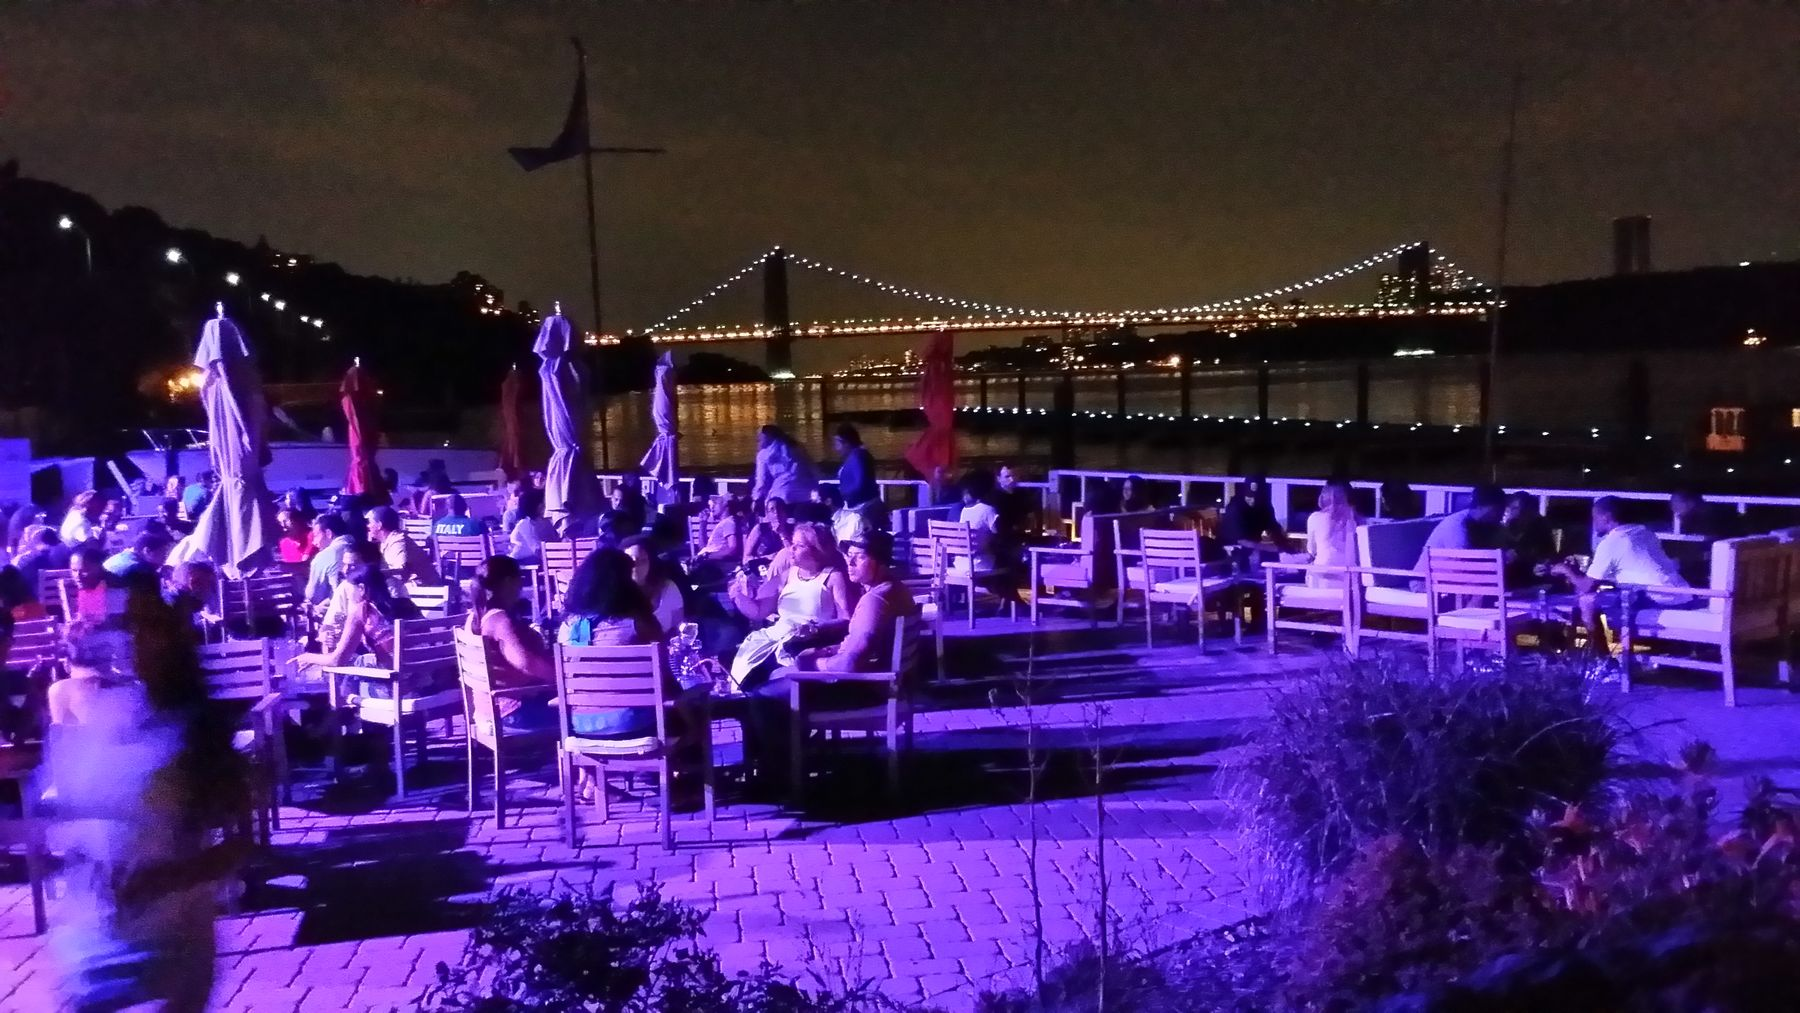 La Marina Washington Heights Domincan Night Life New York